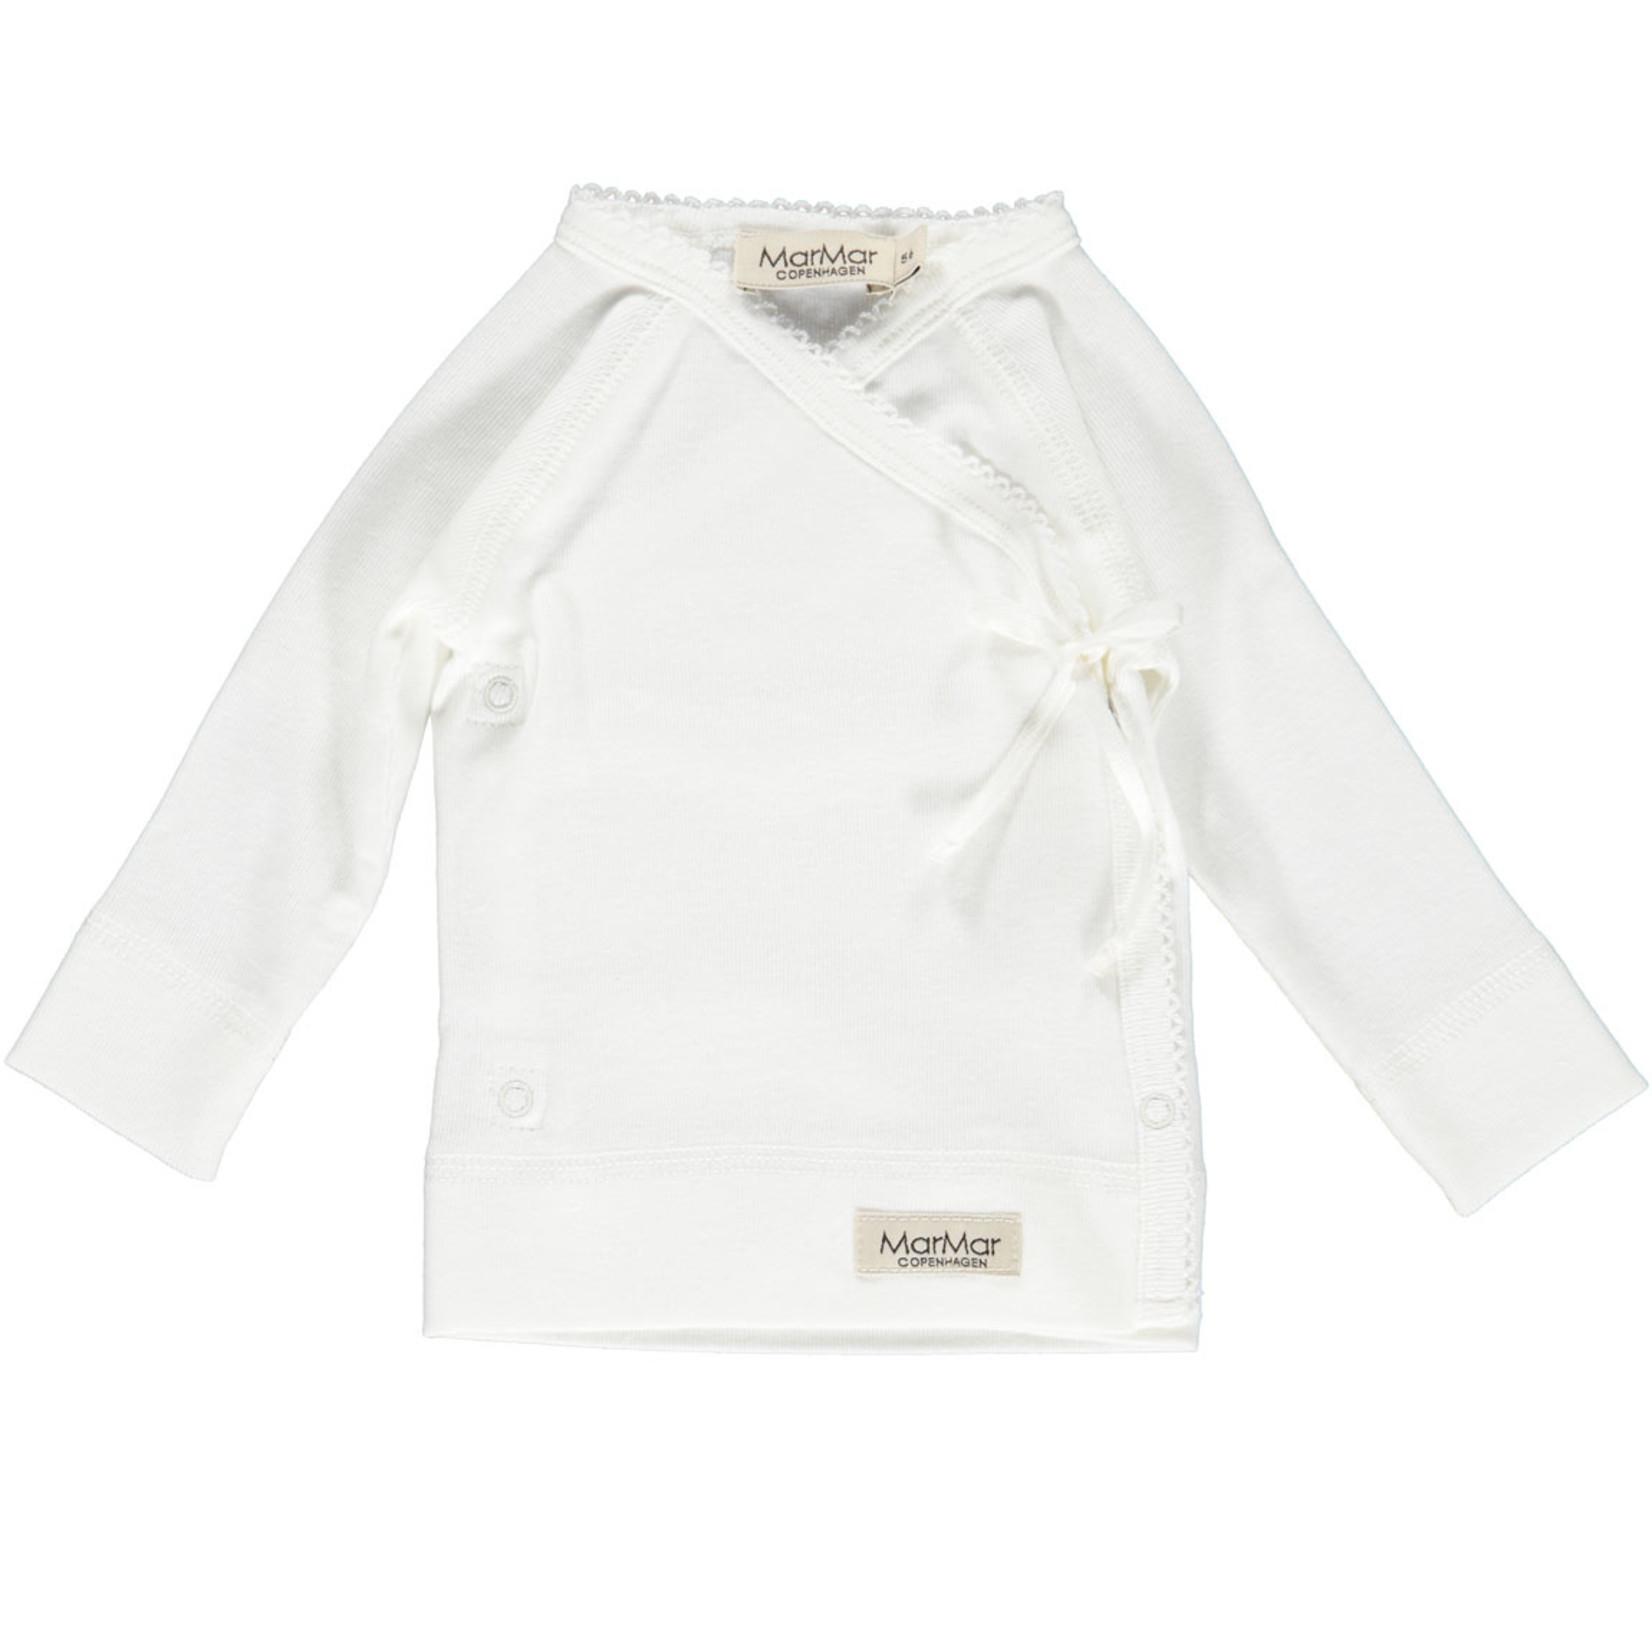 MarMar MarMar - Tut Wrap LS - Gentle White